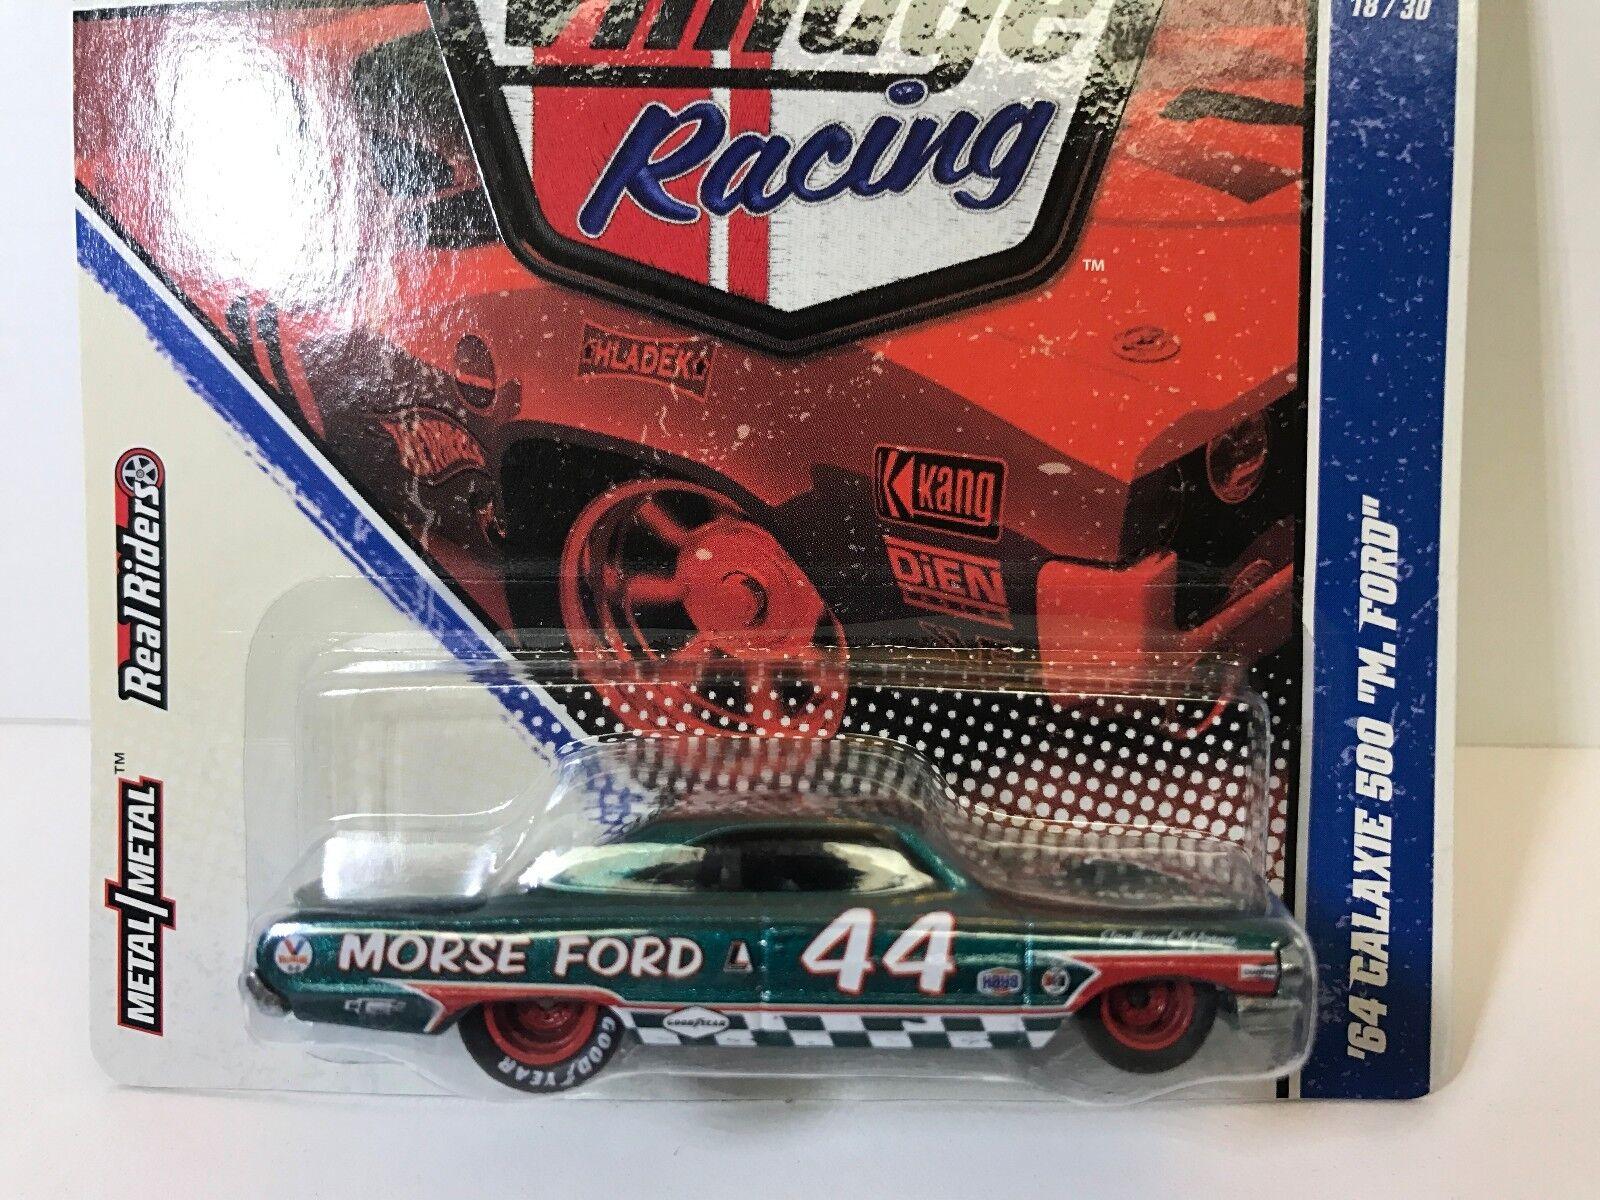 heiß Wheels Jahr Racing Morse Ford 1964 Galaxy (Rare Beautiful voiture)   Protecto